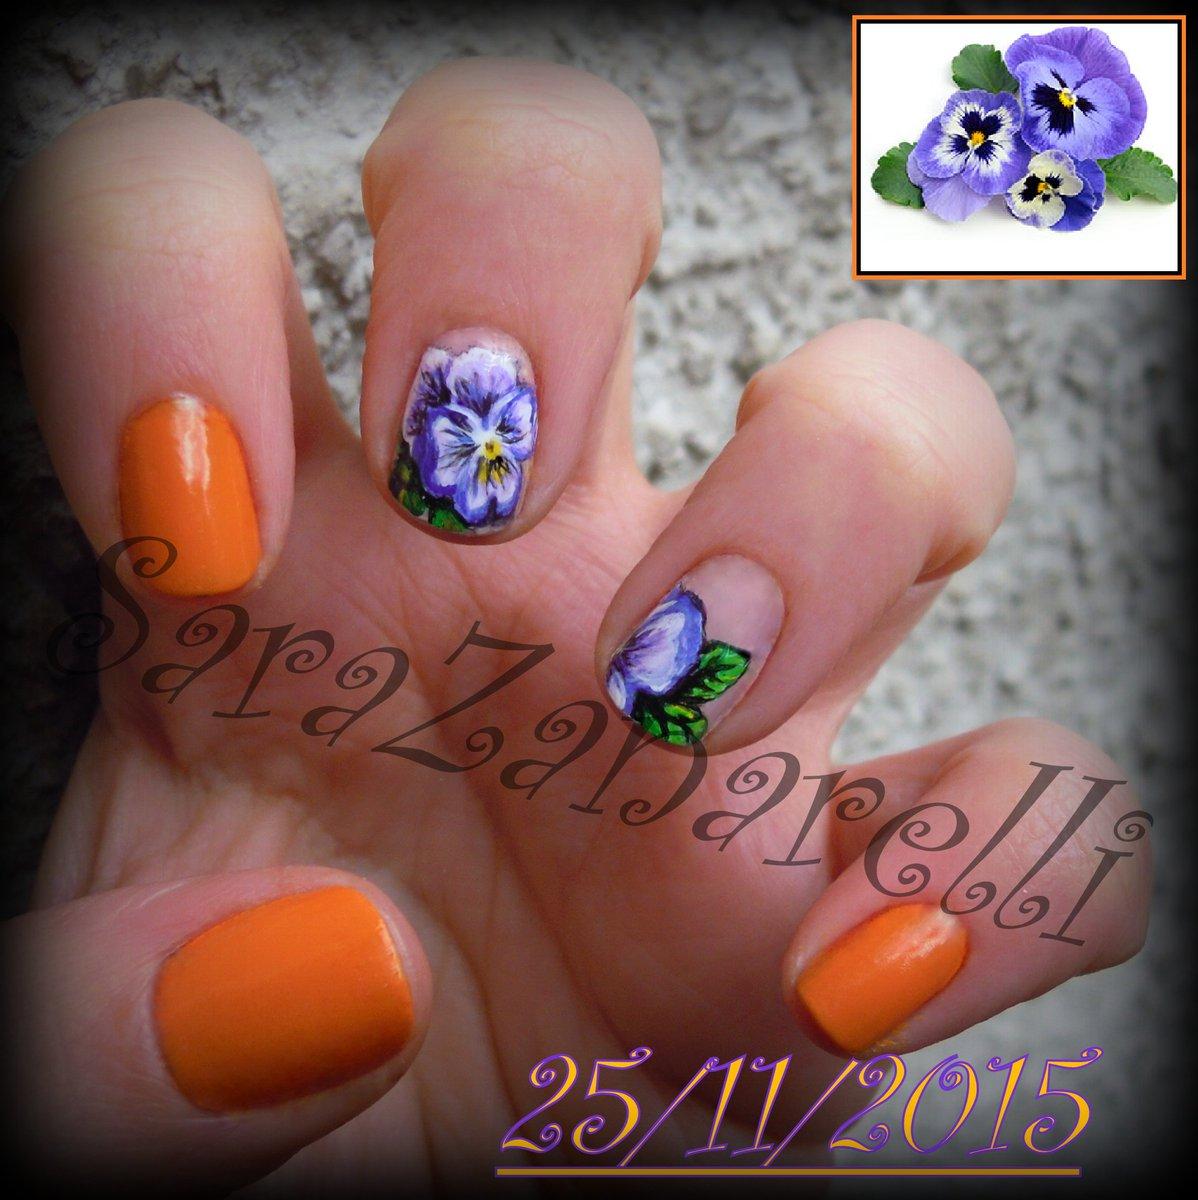 Nails Unghie Nail Nailart Naiesign Micropittura Flower Violette Fiori Arancione Sarazanarellinails Pic Twitter 8fhpcsn6rt